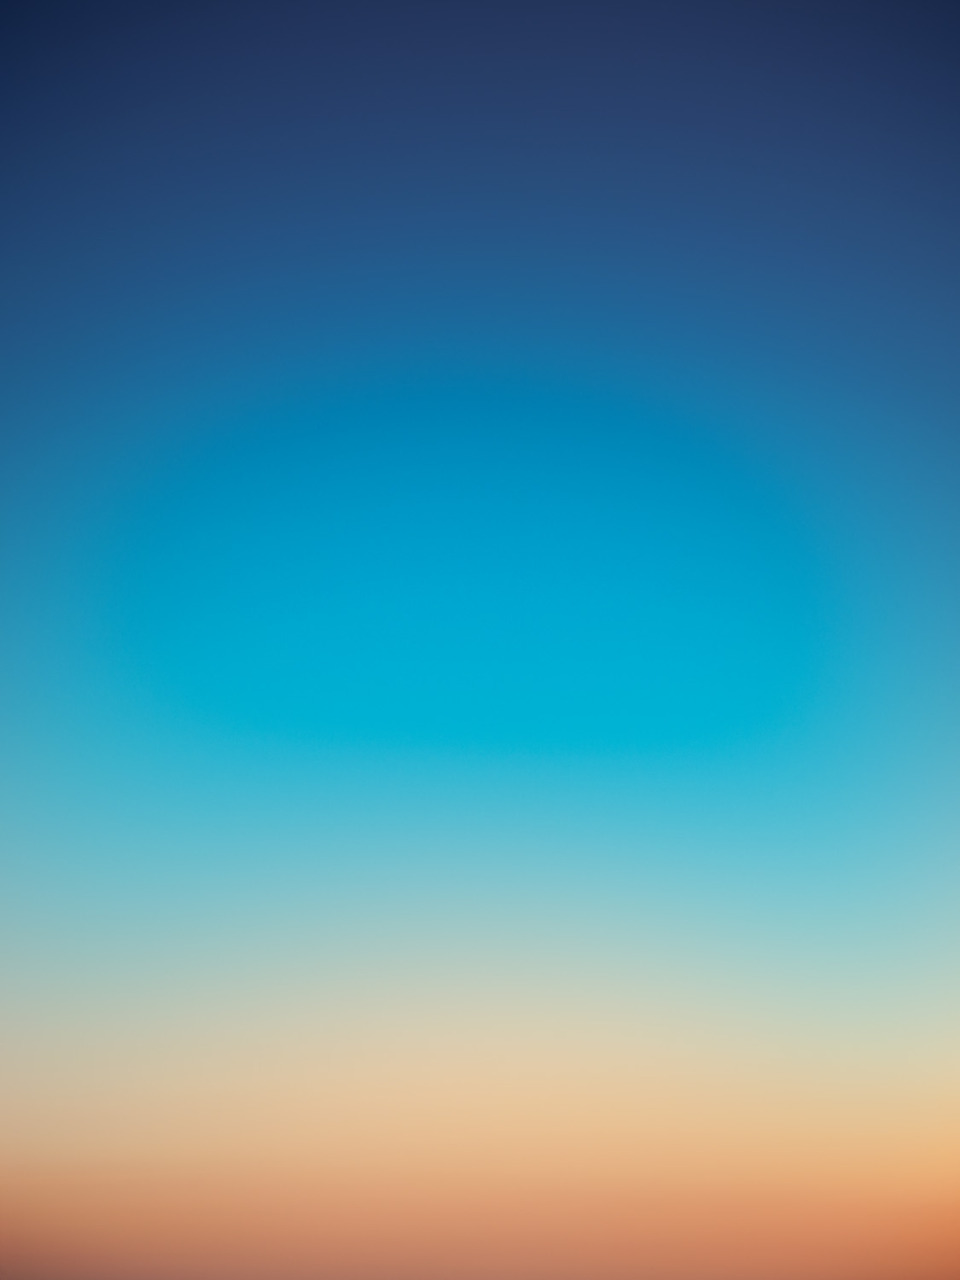 Punta Cana Dominican Repulic—Sunrise 6:58am, 2011  Eric Cahan